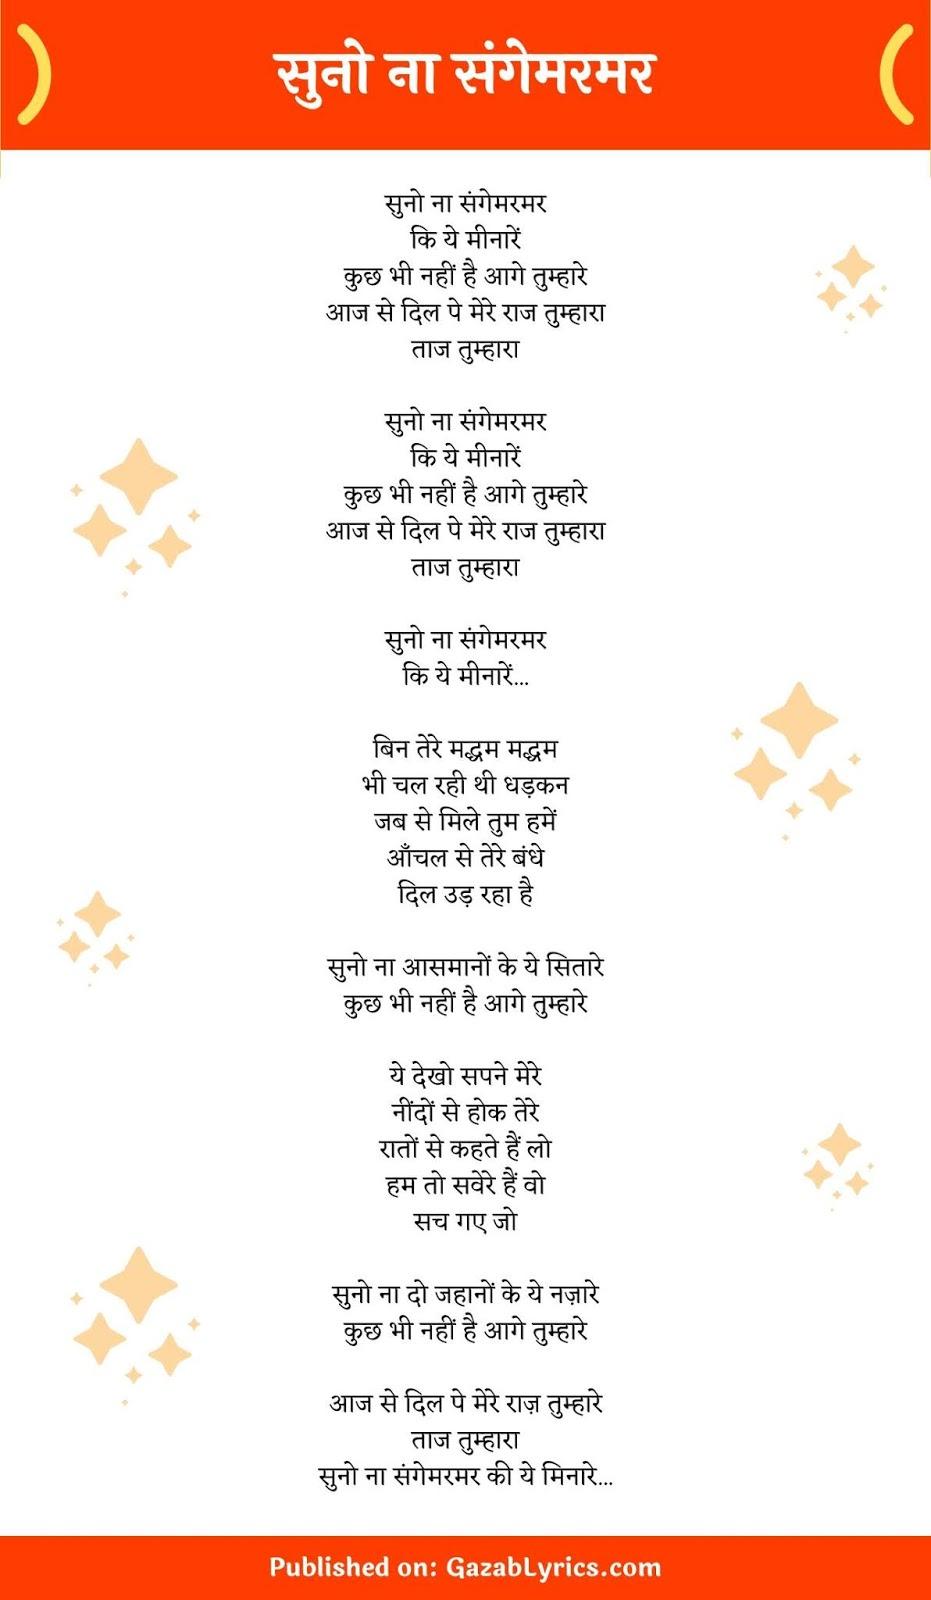 Suno Na Sangemarmar song lyrics image